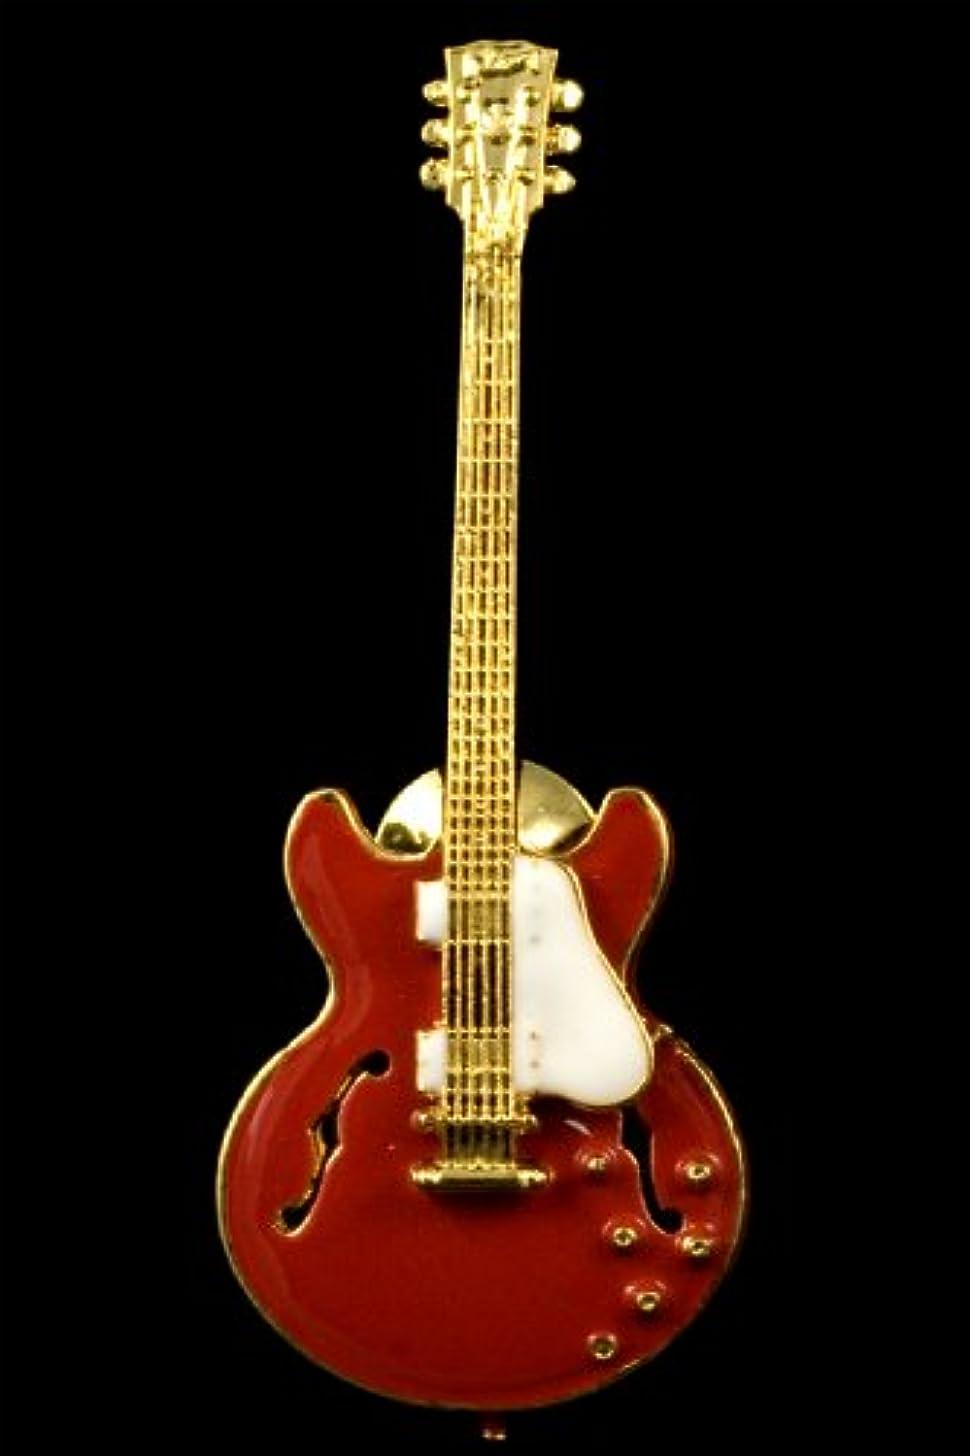 ES335 Hollowbody Guitar Pin - Red